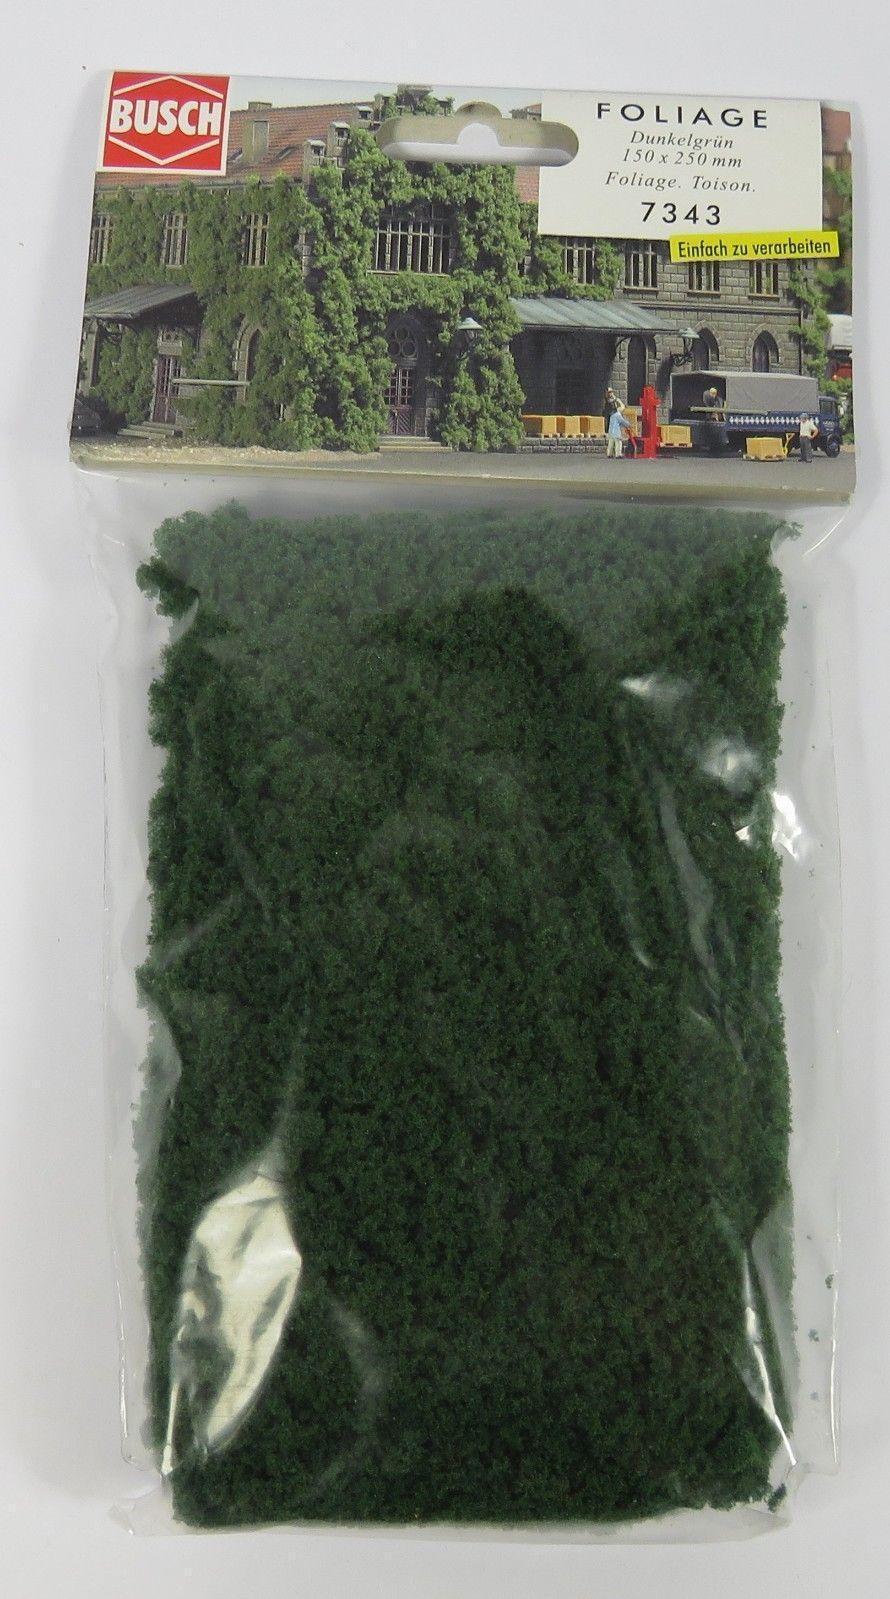 Busch 7333 NEW FOLIAGE MATERIAL DARK GREEN